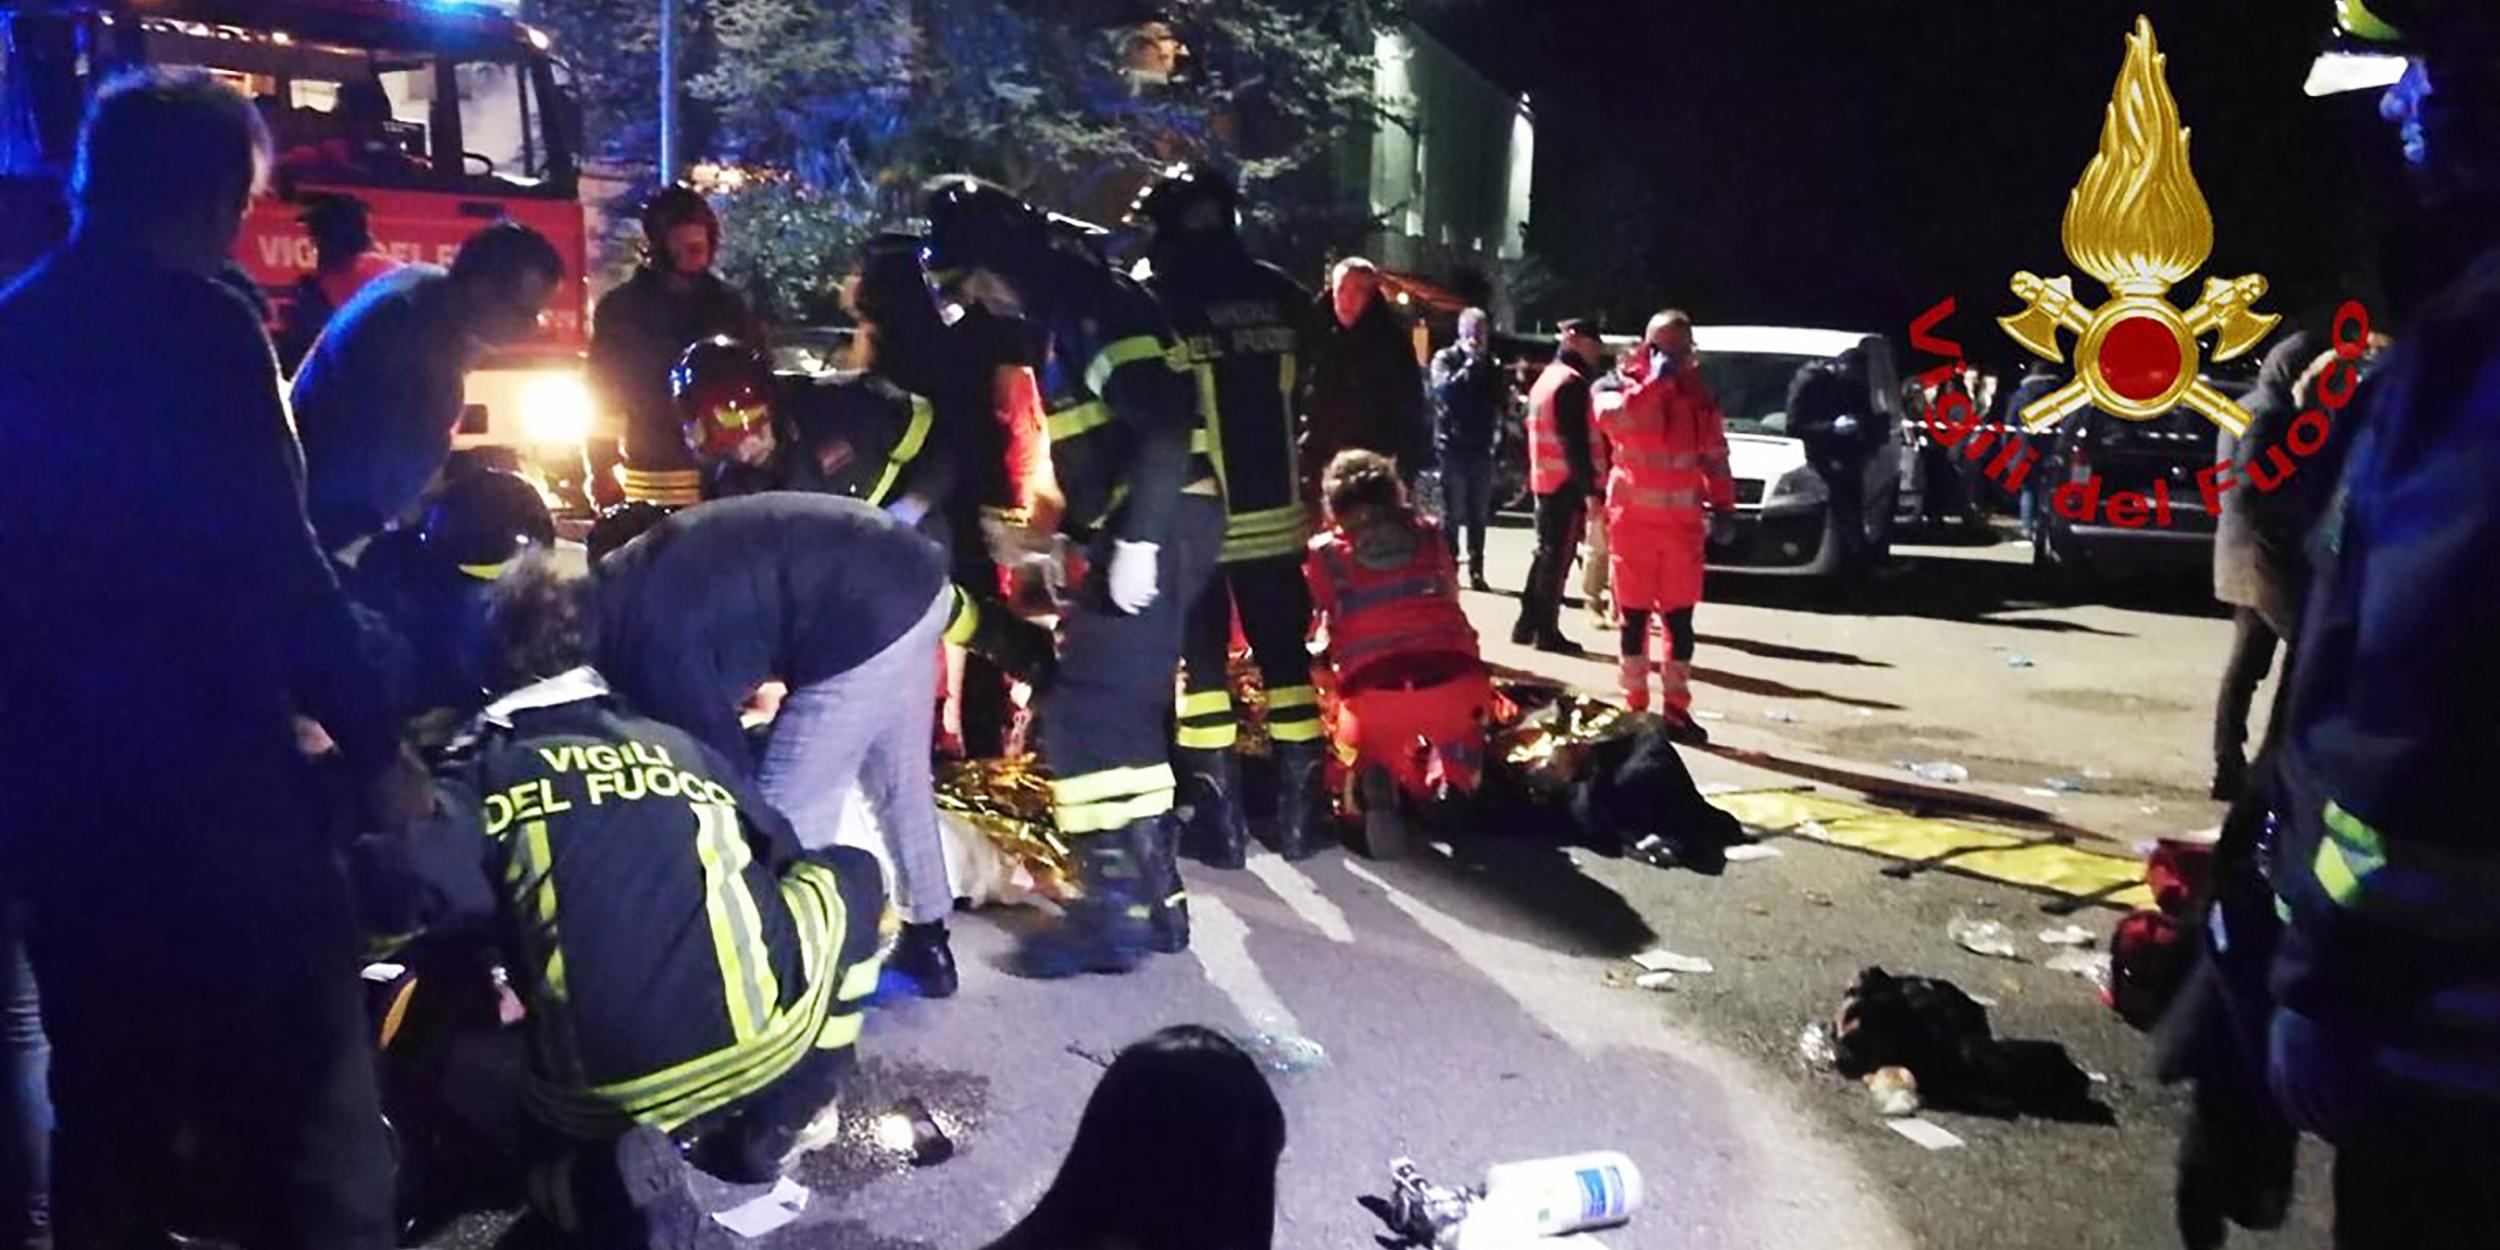 CORINALDO ACCIDENT